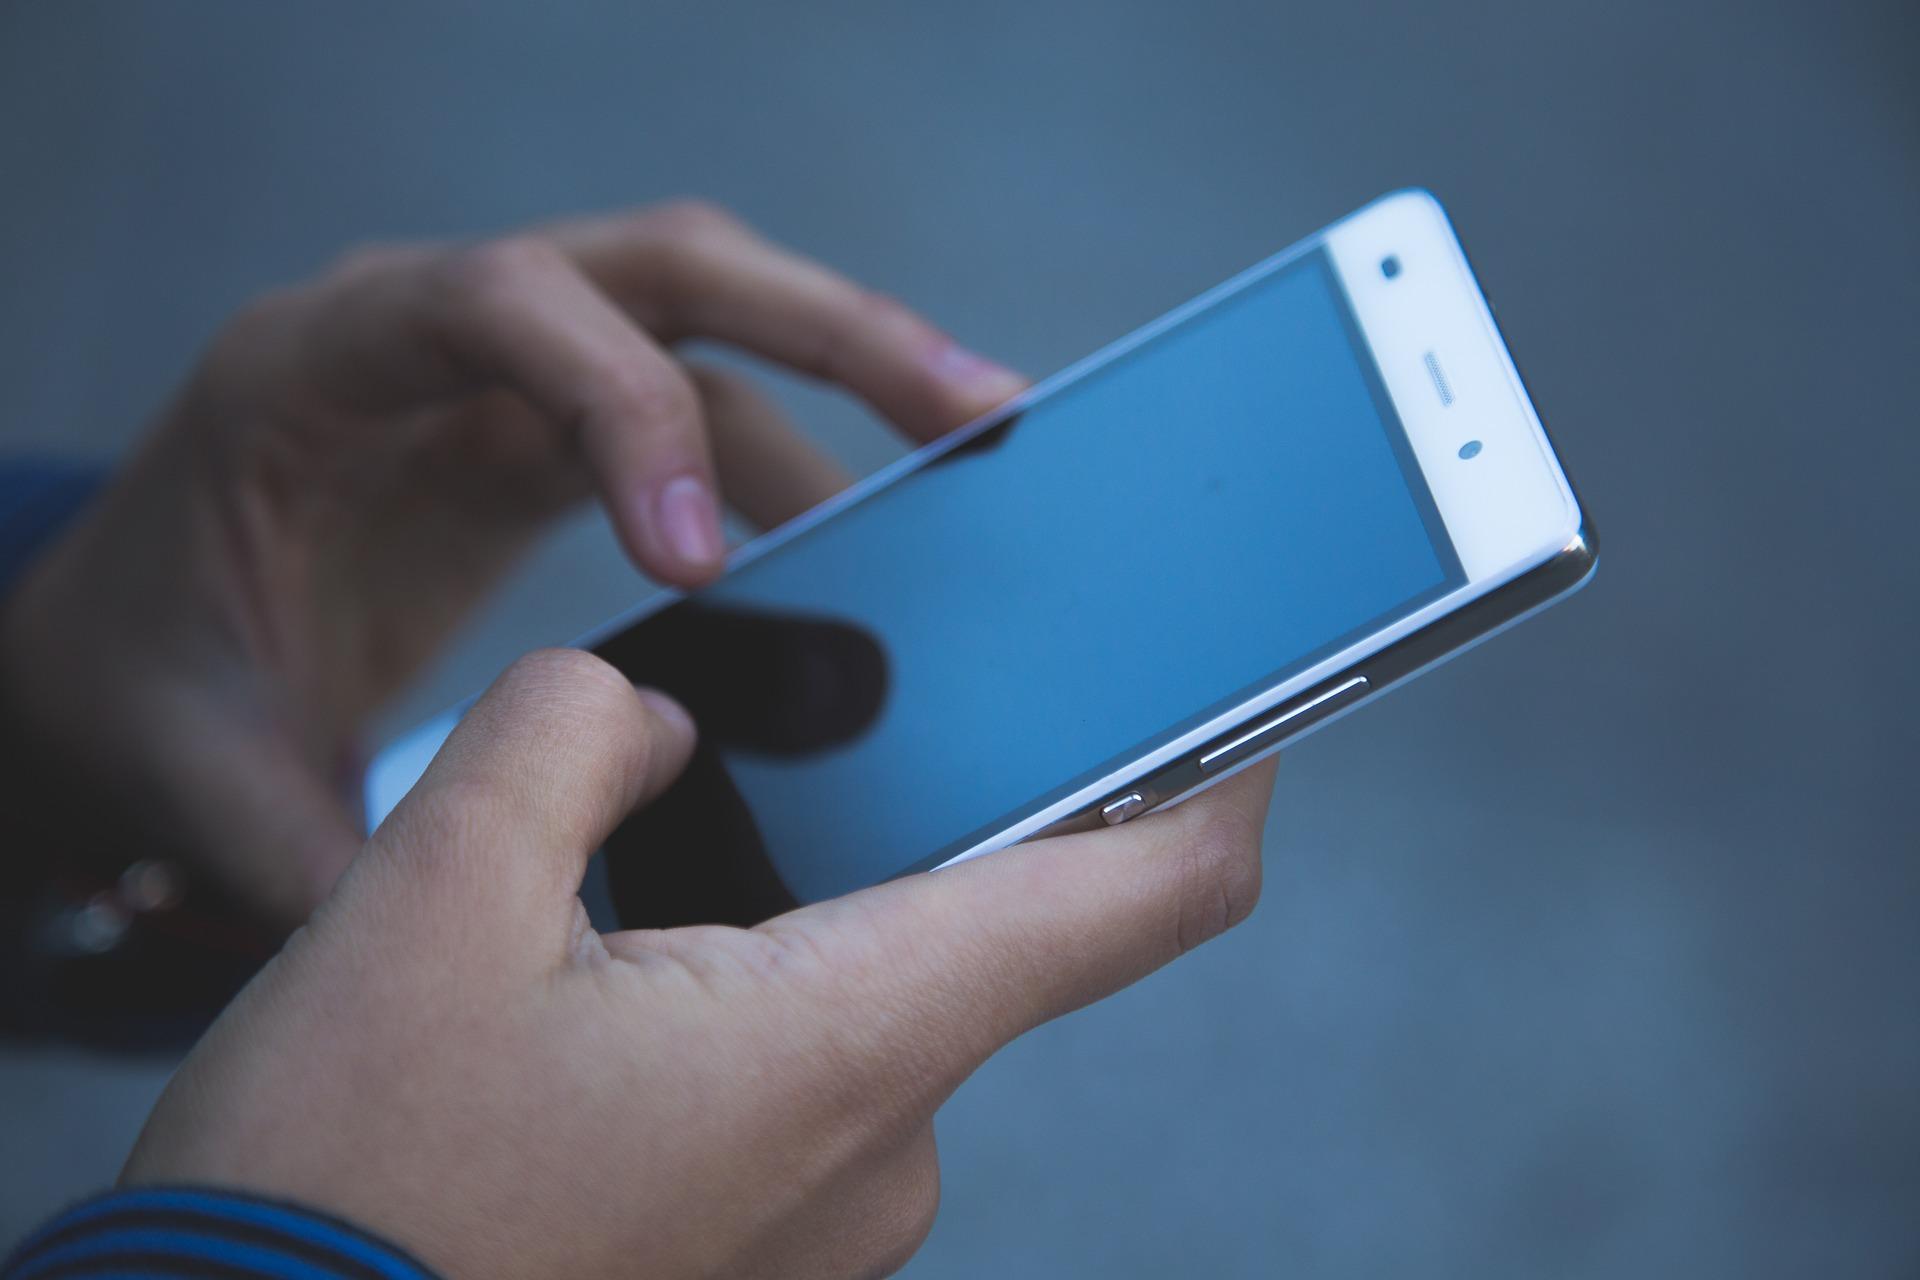 Apps vs. Bots: Wie sieht die digitale Zukunft aus?